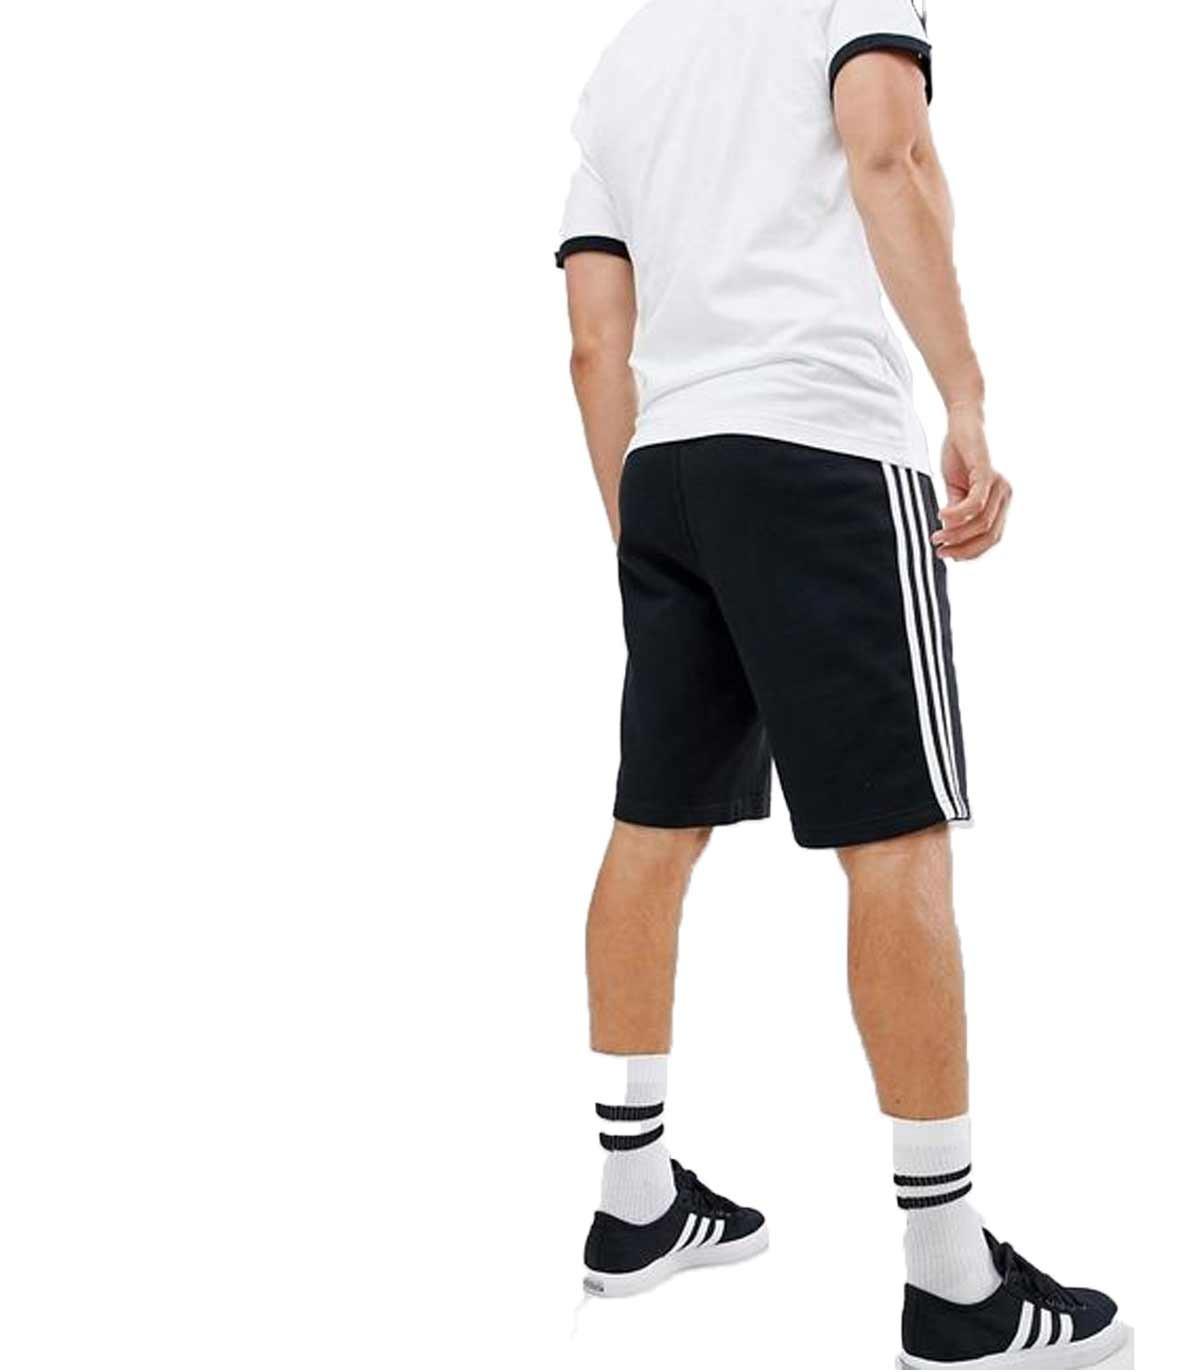 0ecbe2efa4eb Comprar Pantalón Adidas 3-Stripe Short   ADIDAS ORIGINALS